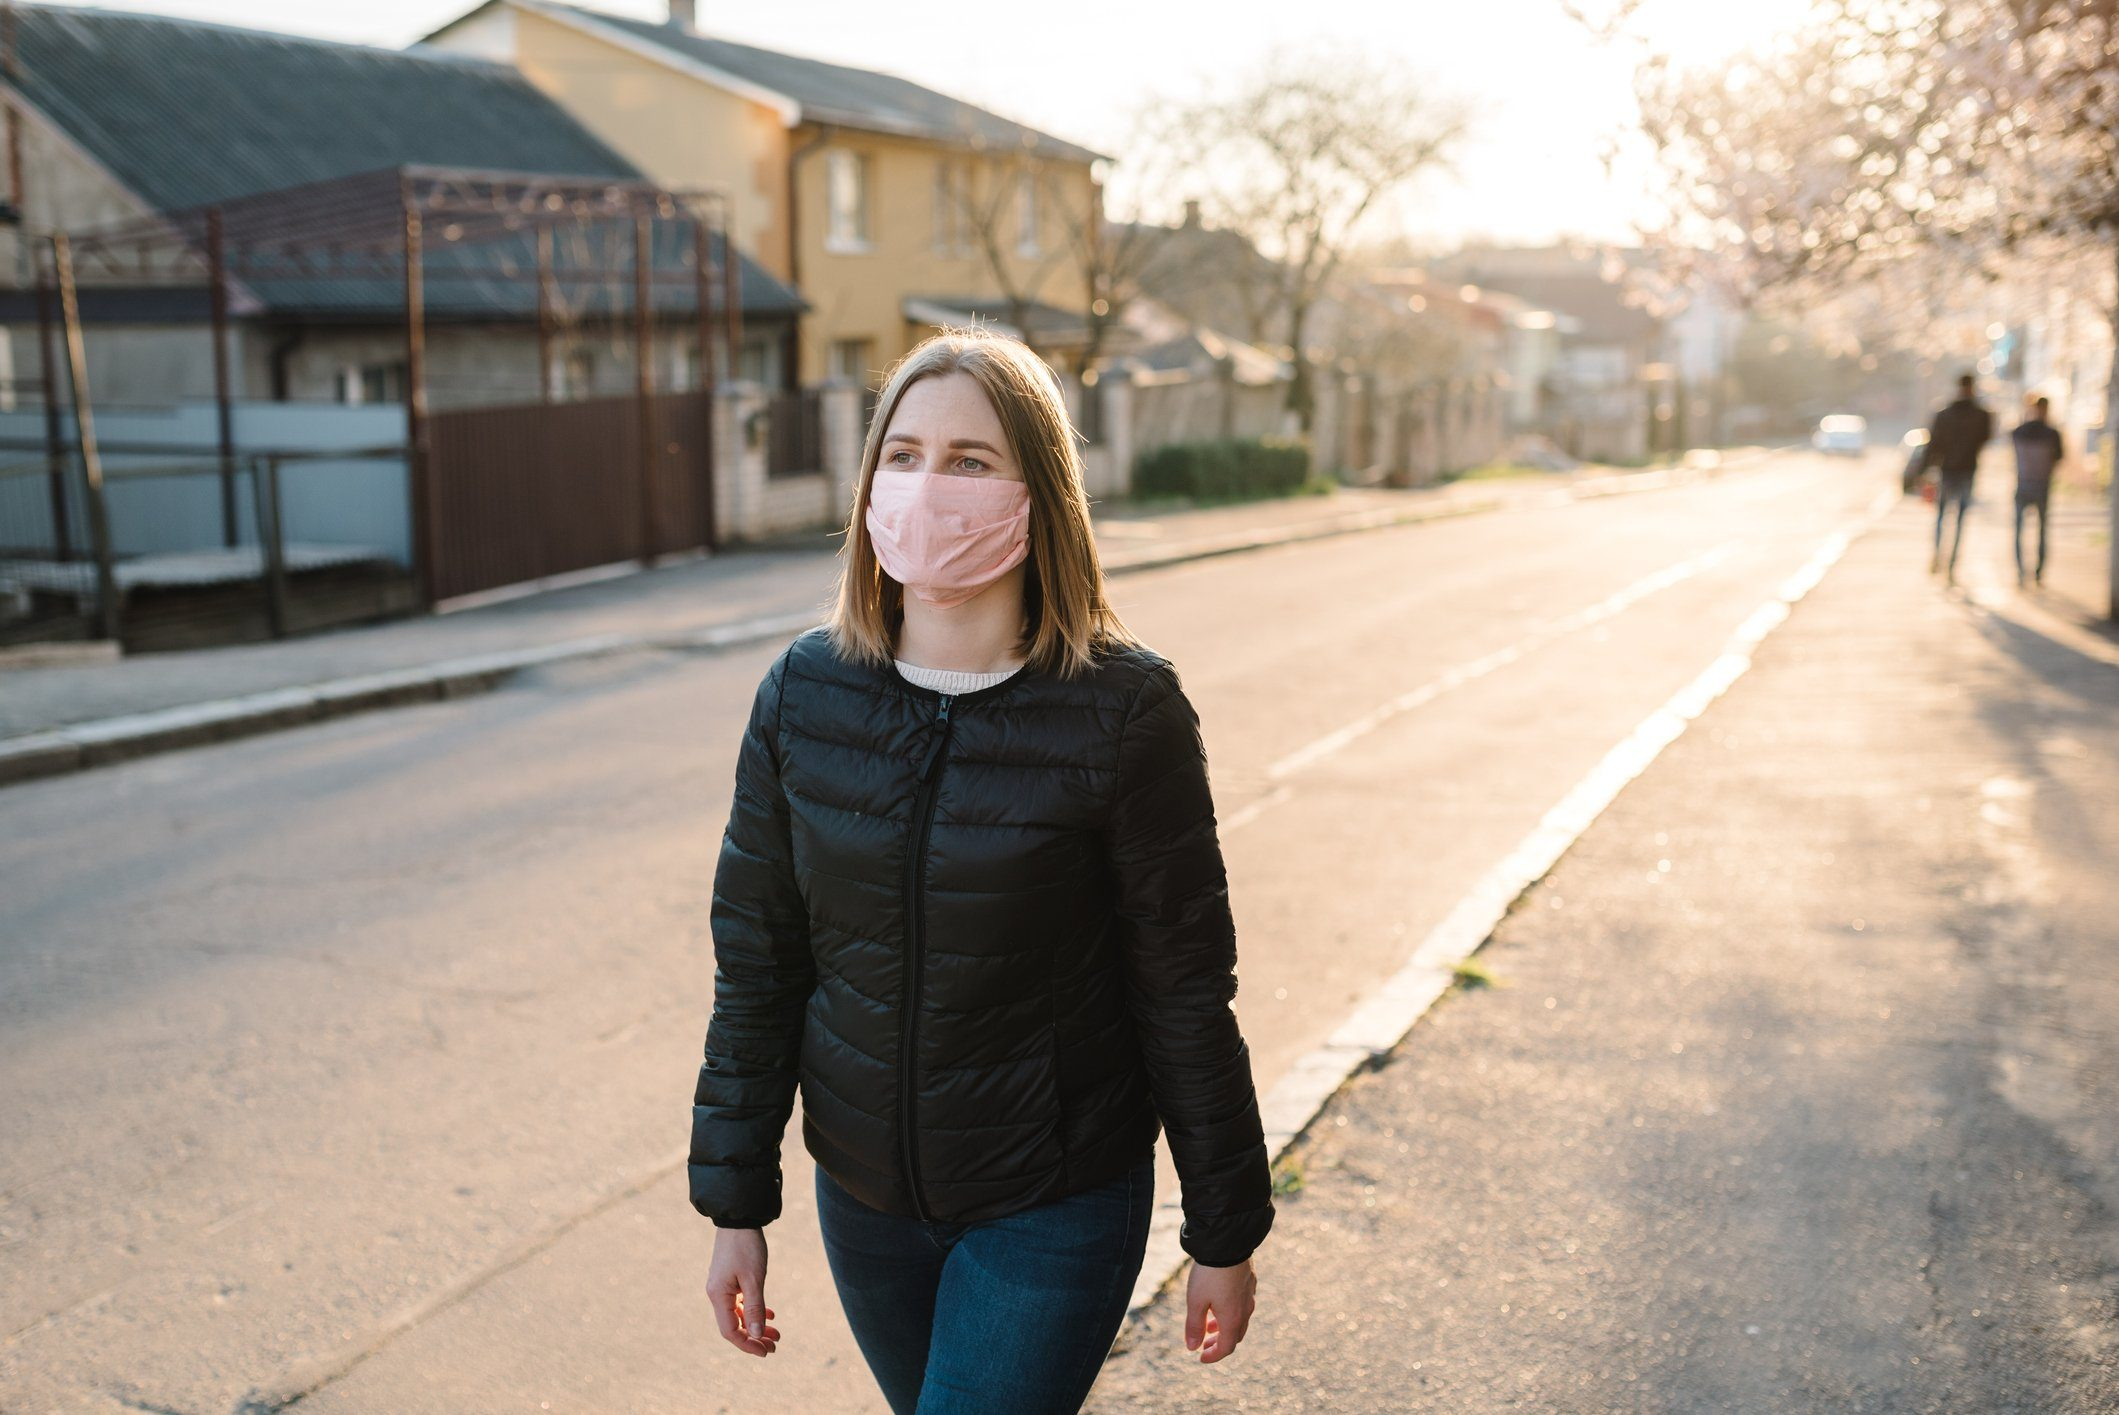 woman walking with mask on during coronavirus pandemic